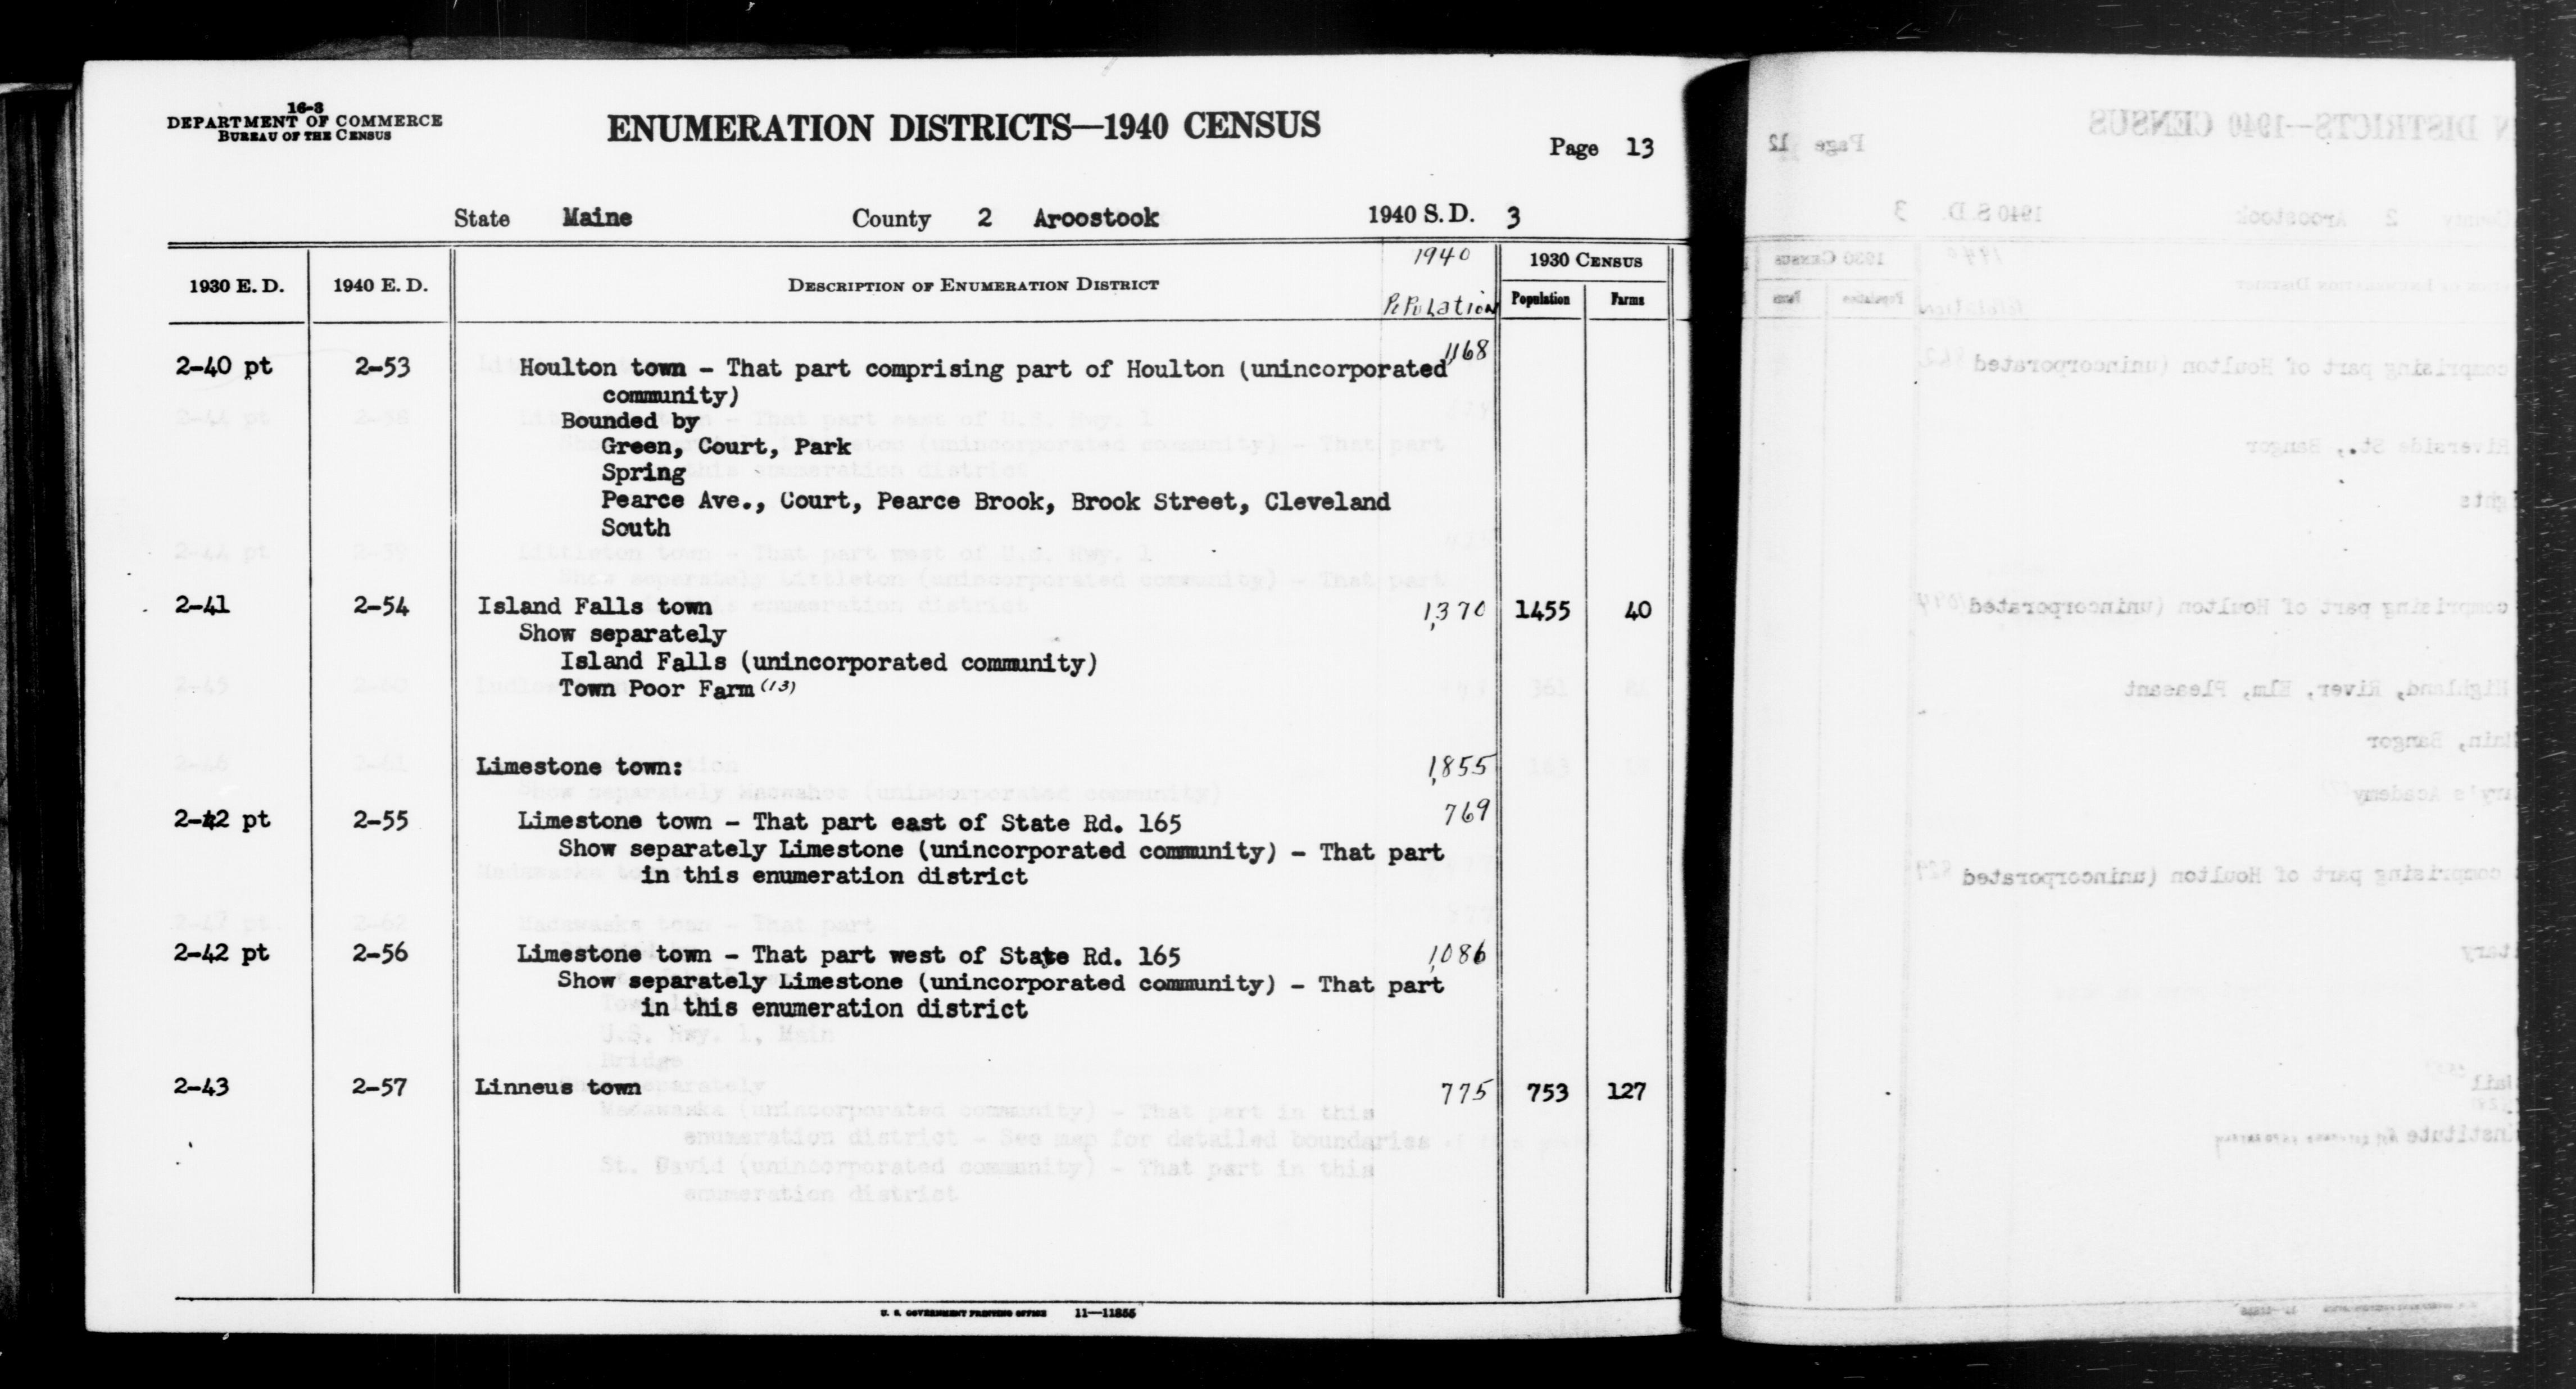 1940 Census Enumeration District Descriptions - Maine - Aroostook County - ED 2-53, ED 2-54, ED 2-55, ED 2-56, ED 2-57